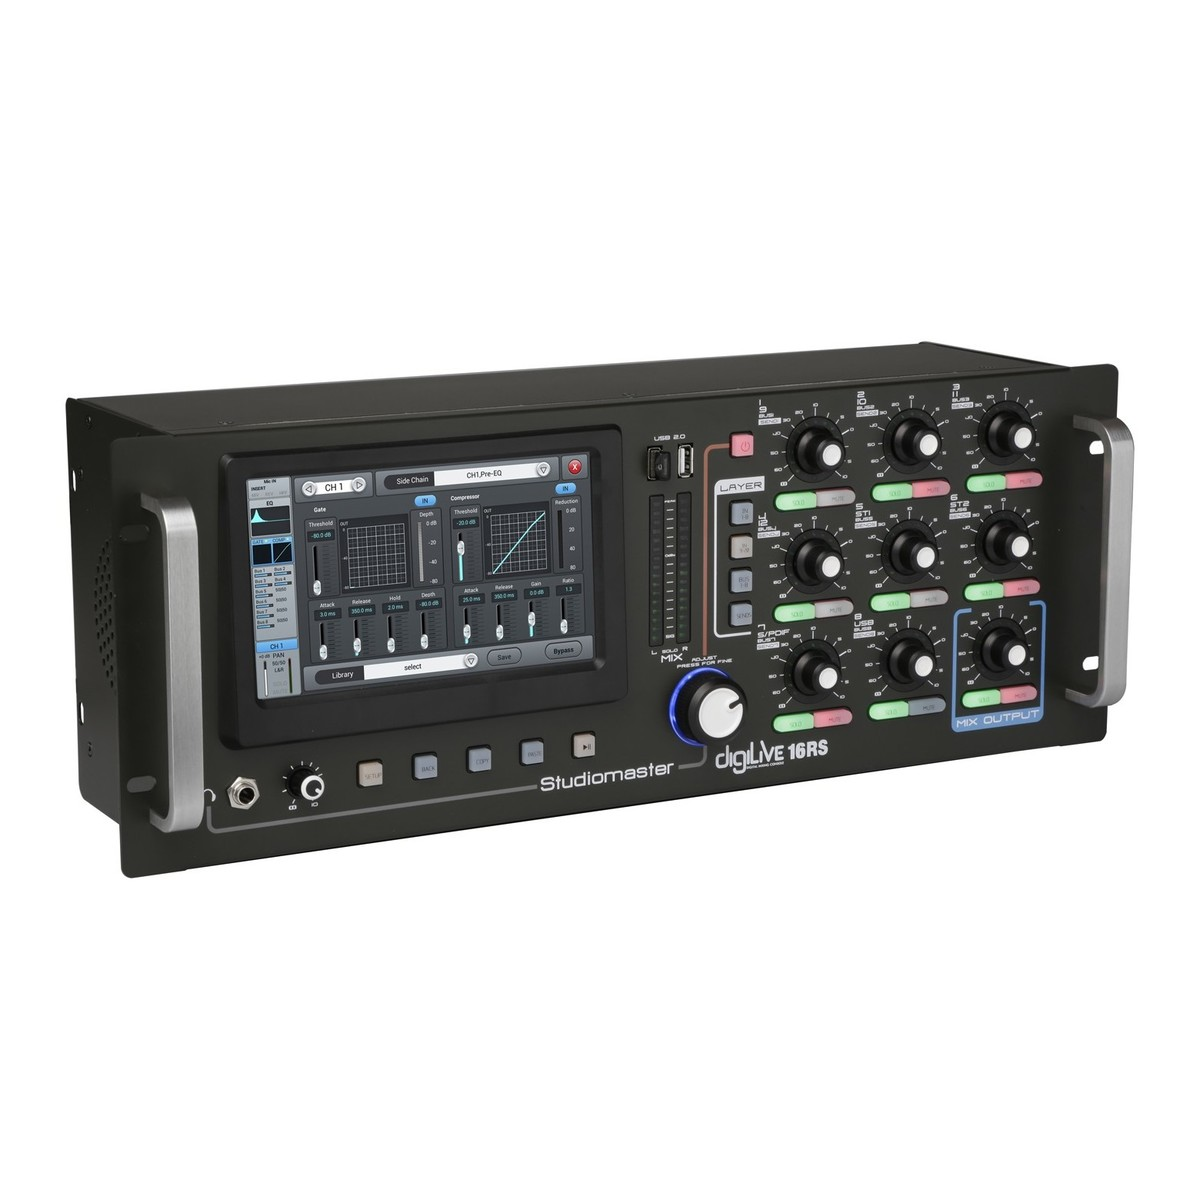 Studiomaster Digilive 16rs Digital Rack Mixer At Gear4music